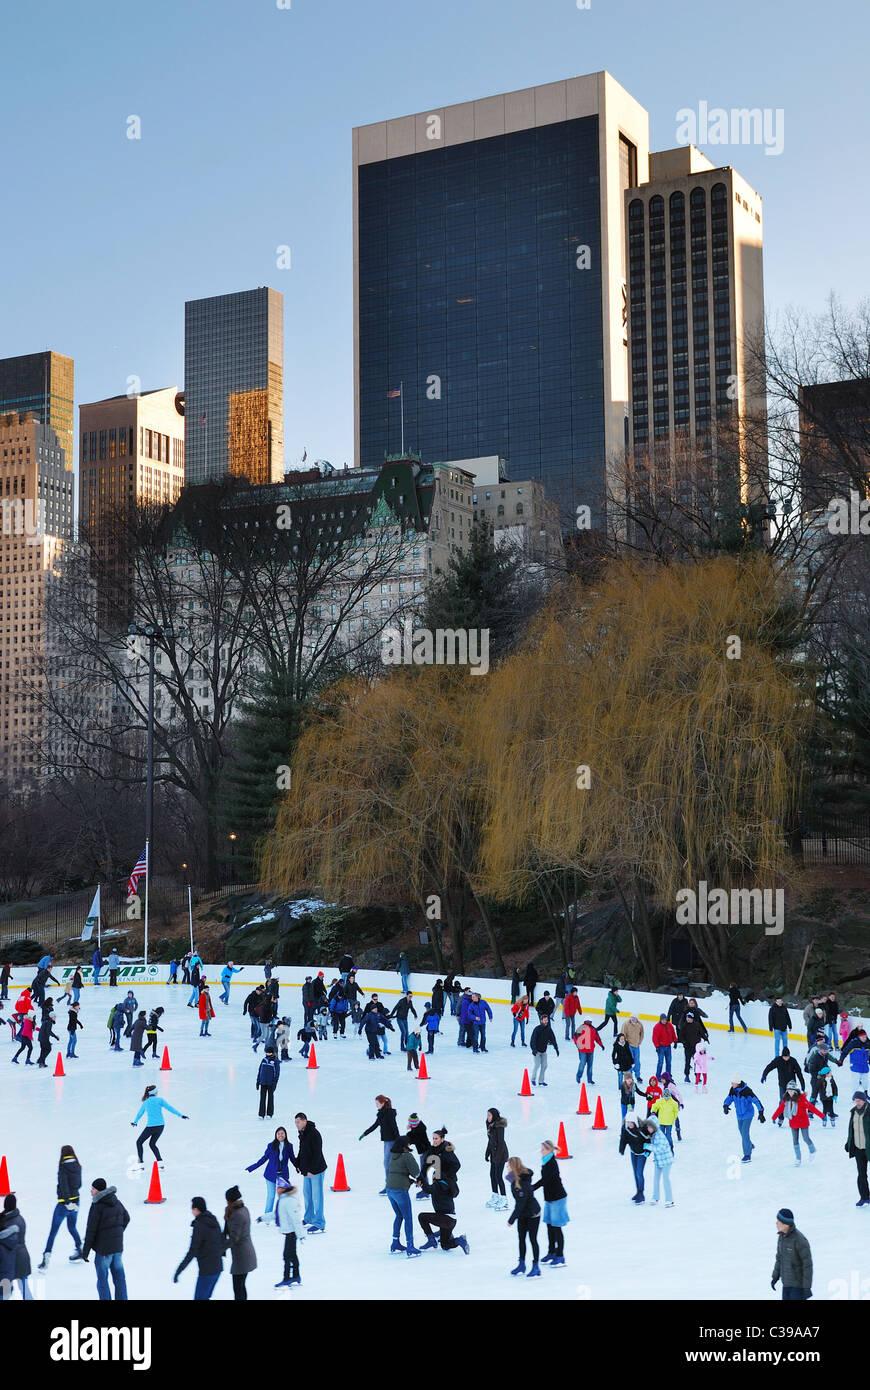 people skate in central park manhattan in new york city Stock Photo